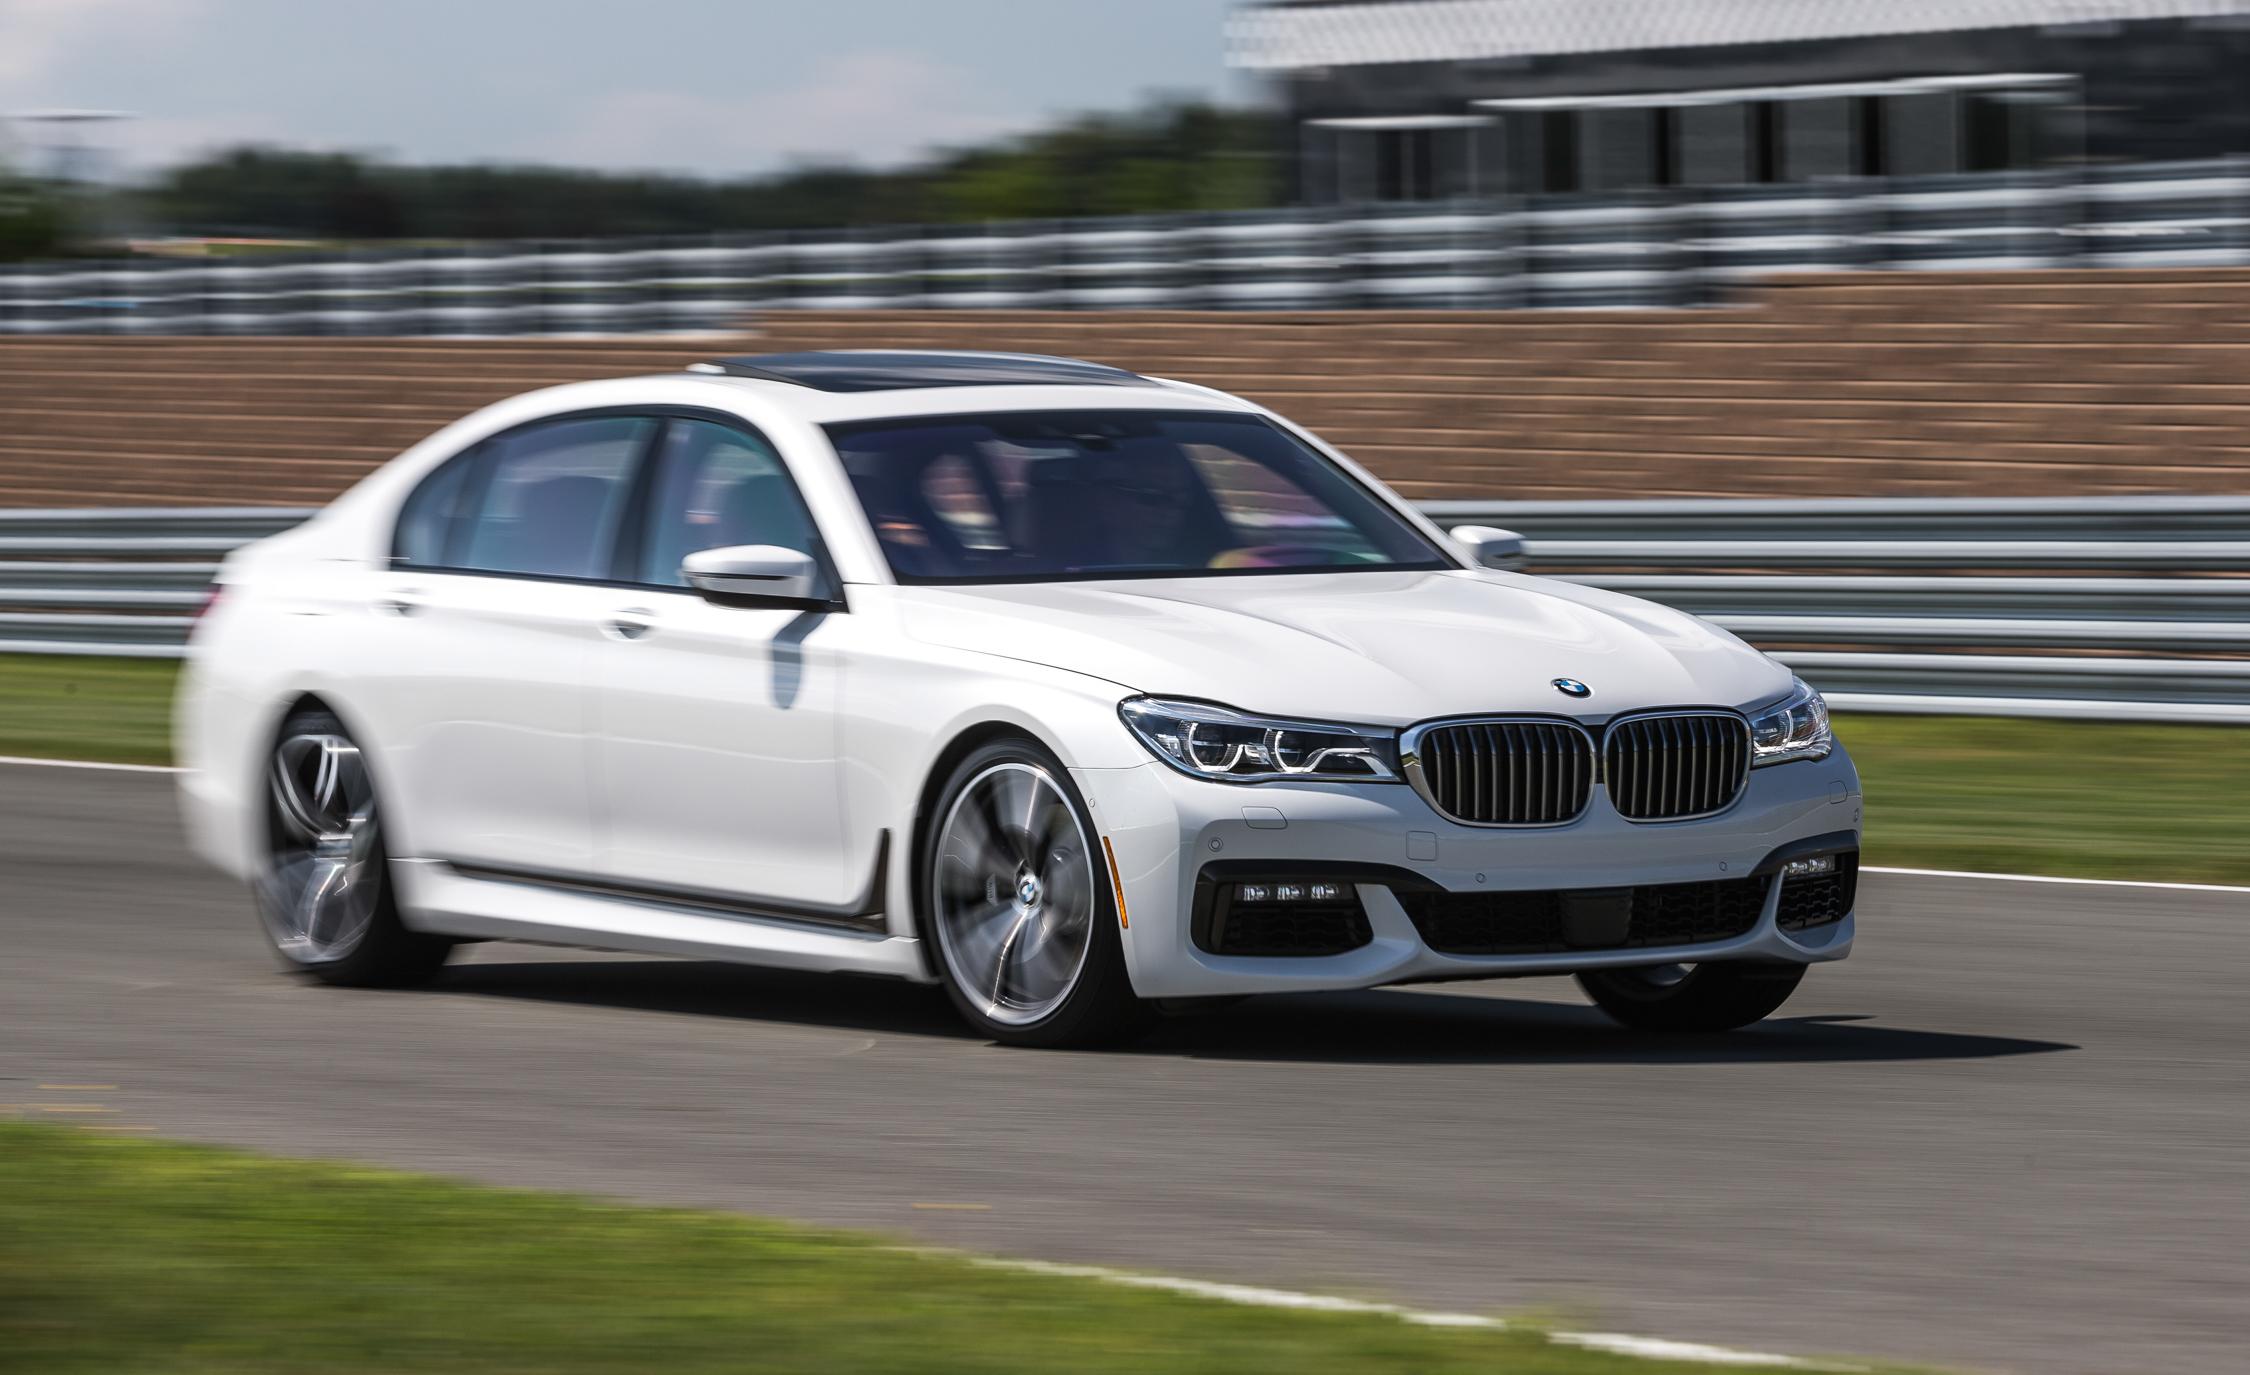 2016 BMW 7 Series White